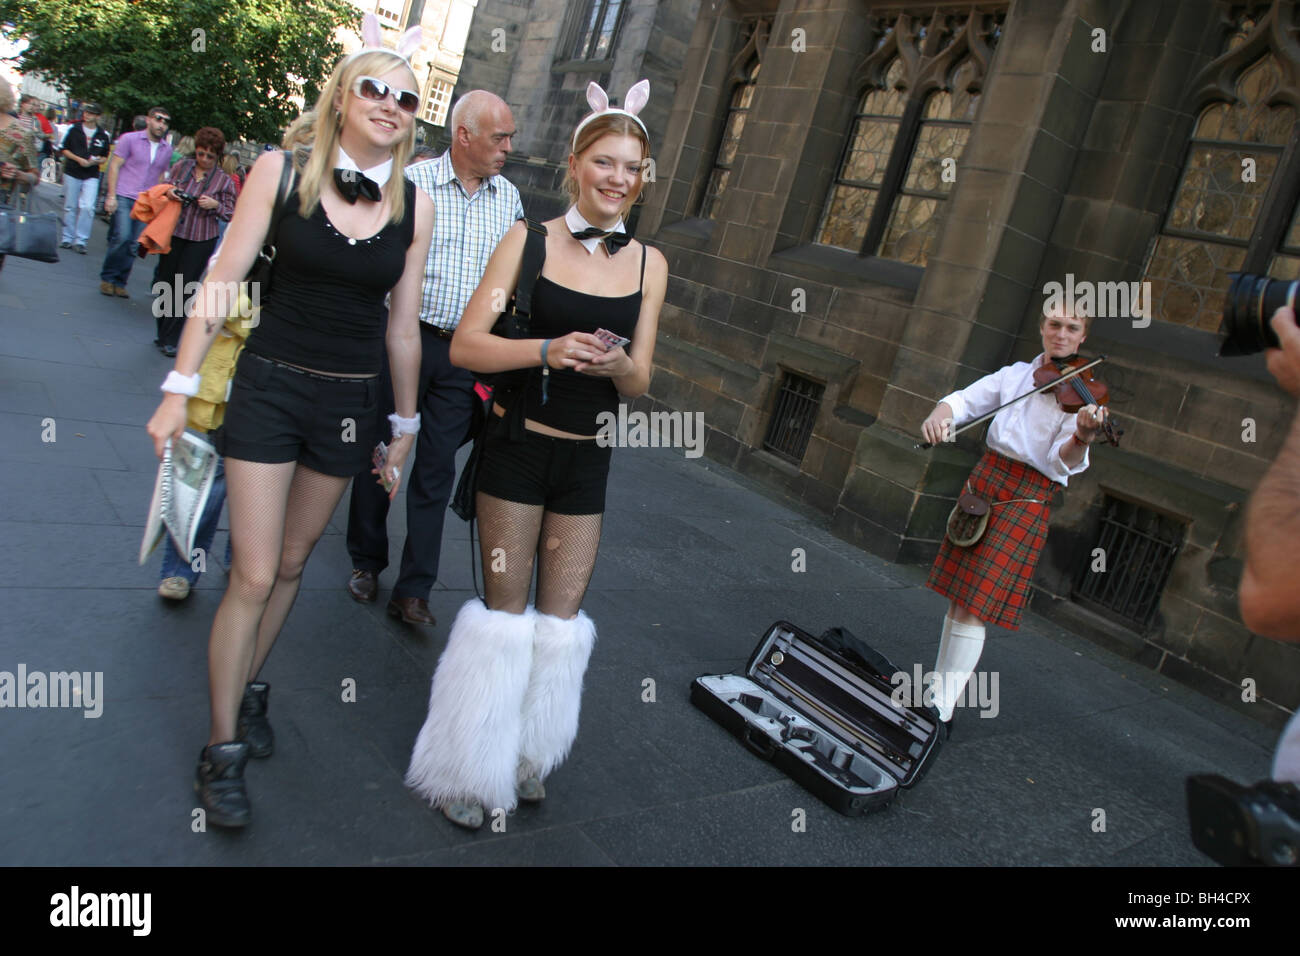 FRINGE FESTIVAL PERFORMERS ON ROYAL MILE, during Edinburgh International Arts Festival, EDINBURGH, SCOTLAND. 2003. - Stock Image